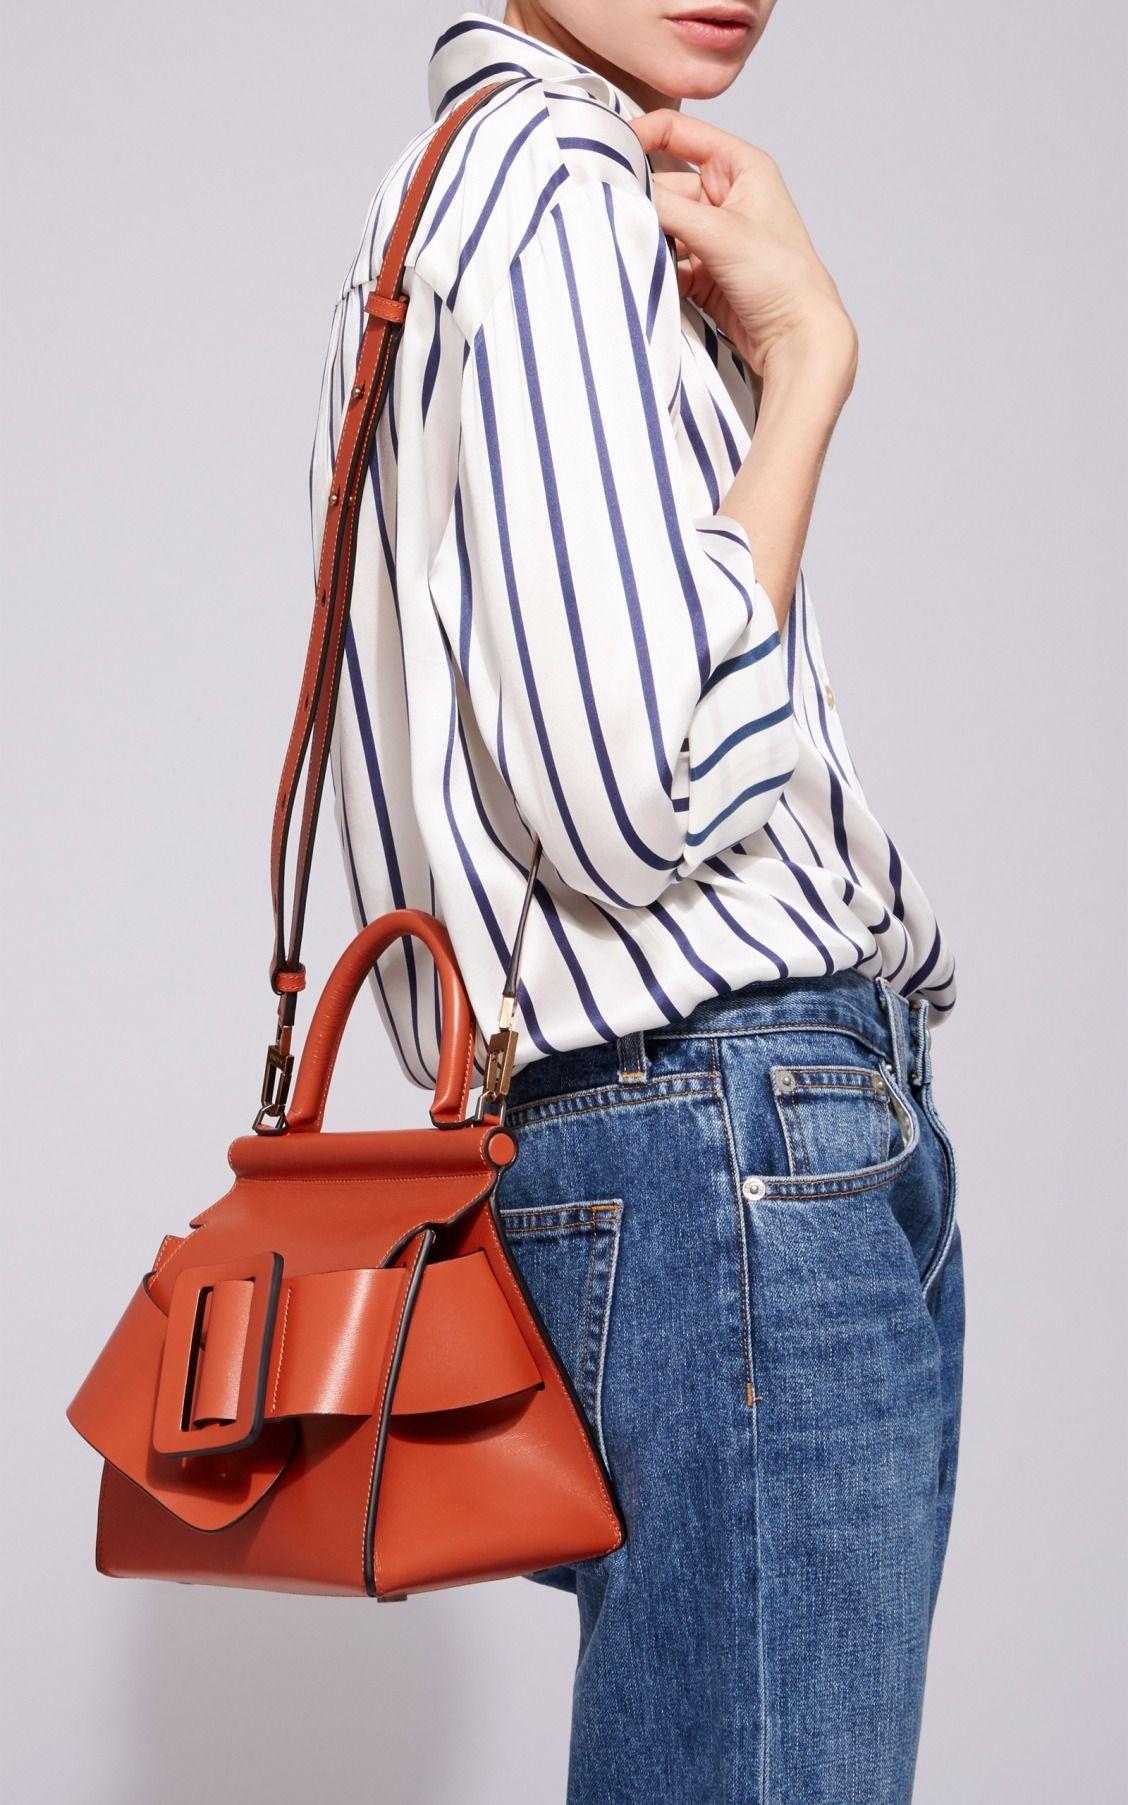 61a6089fe Karl Top Handle Bag by BOYY   Accessories in 2019   Boyy bag, Bags ...